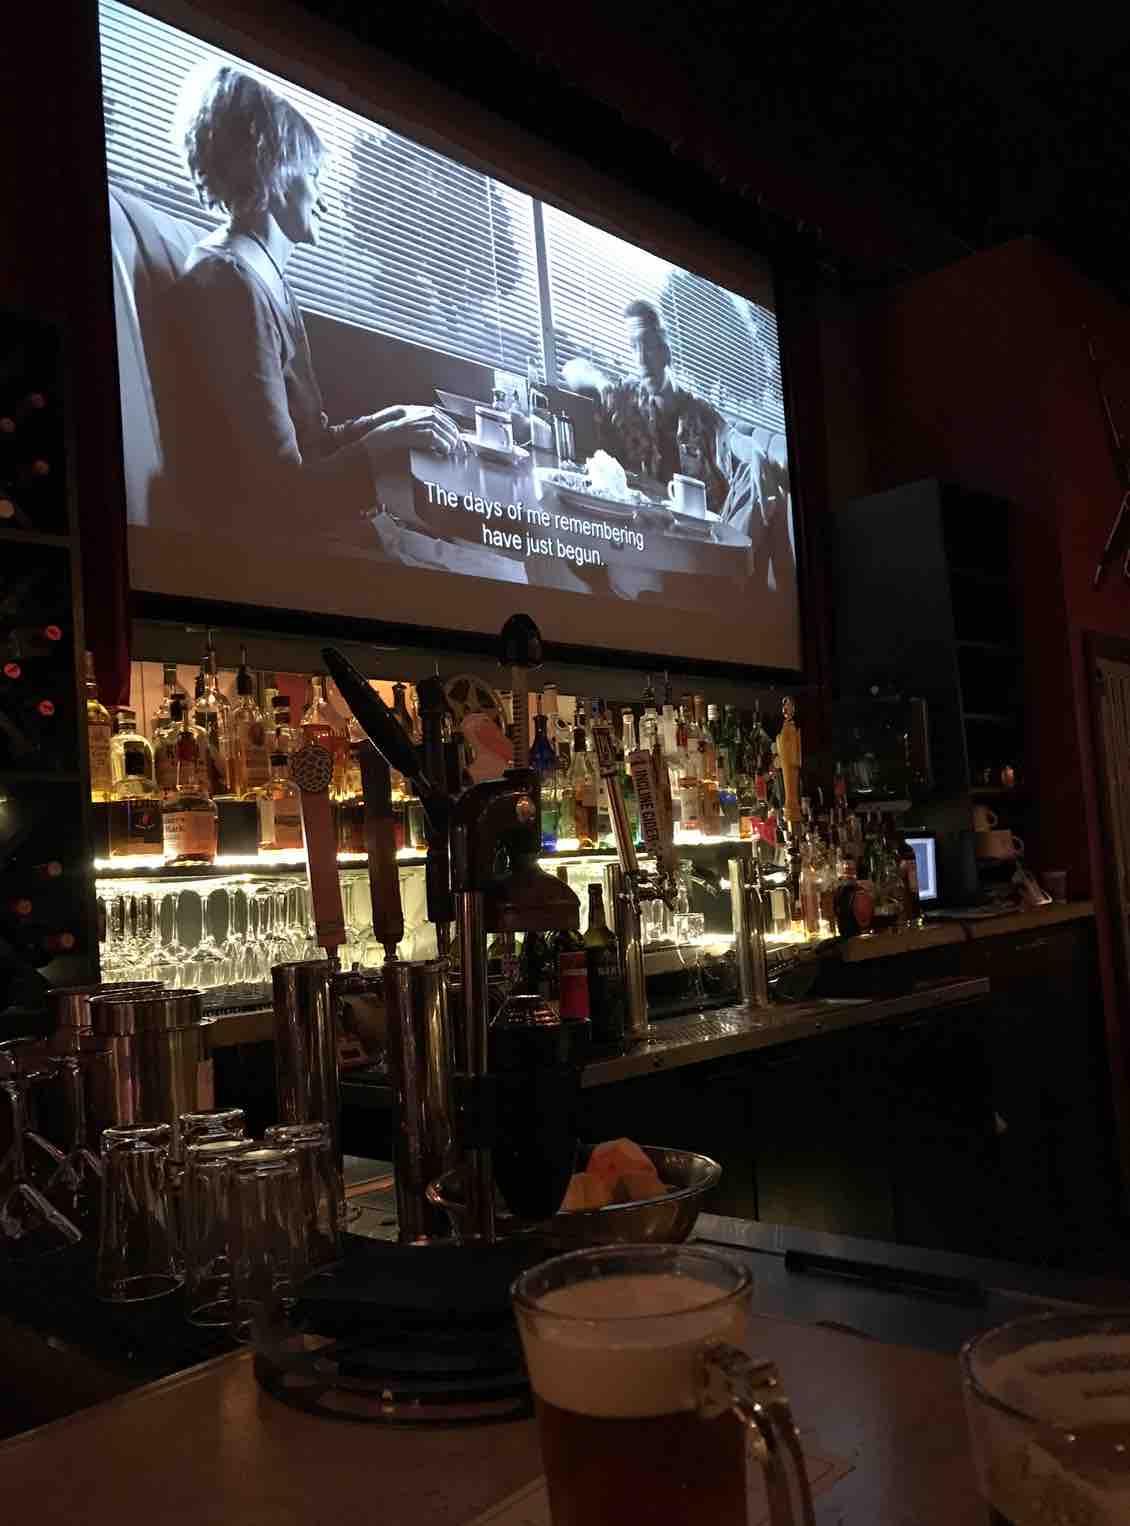 portland-bars-tourism-grimm